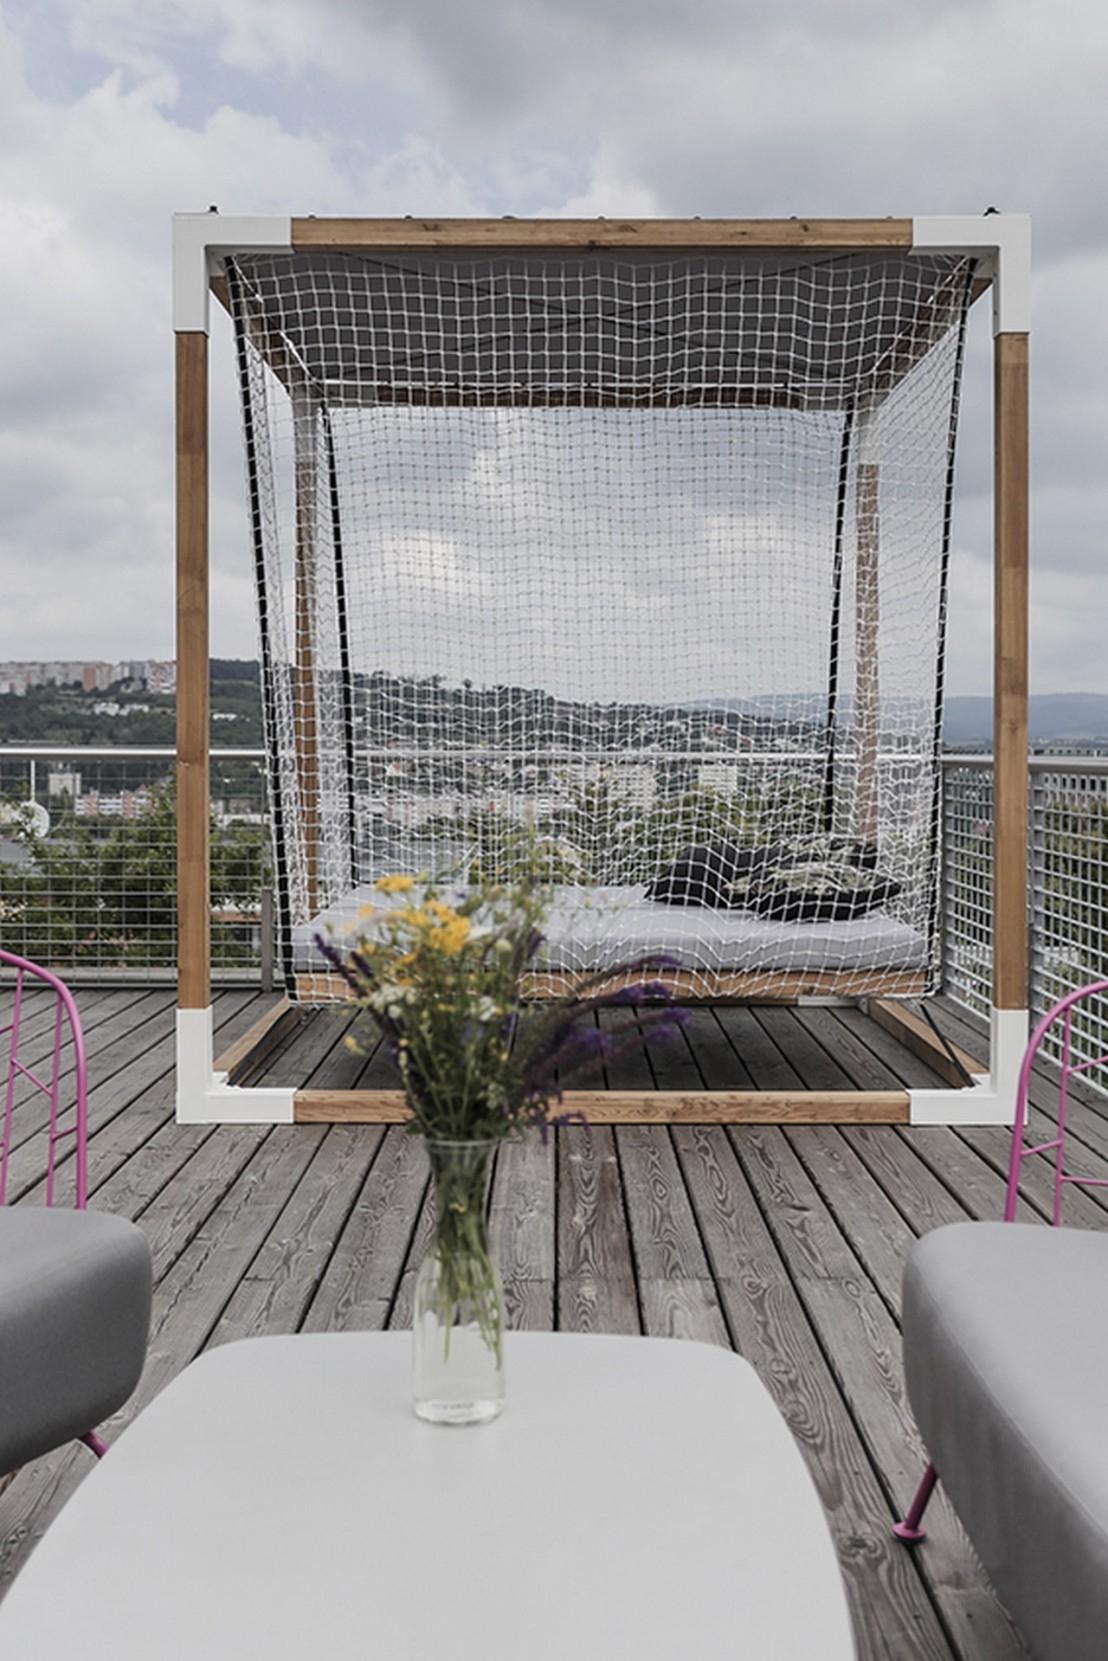 Lit De Jardin Hamac Suspendu En Cage Leva : Mobilier De ... encequiconcerne Lit Suspendu Jardin